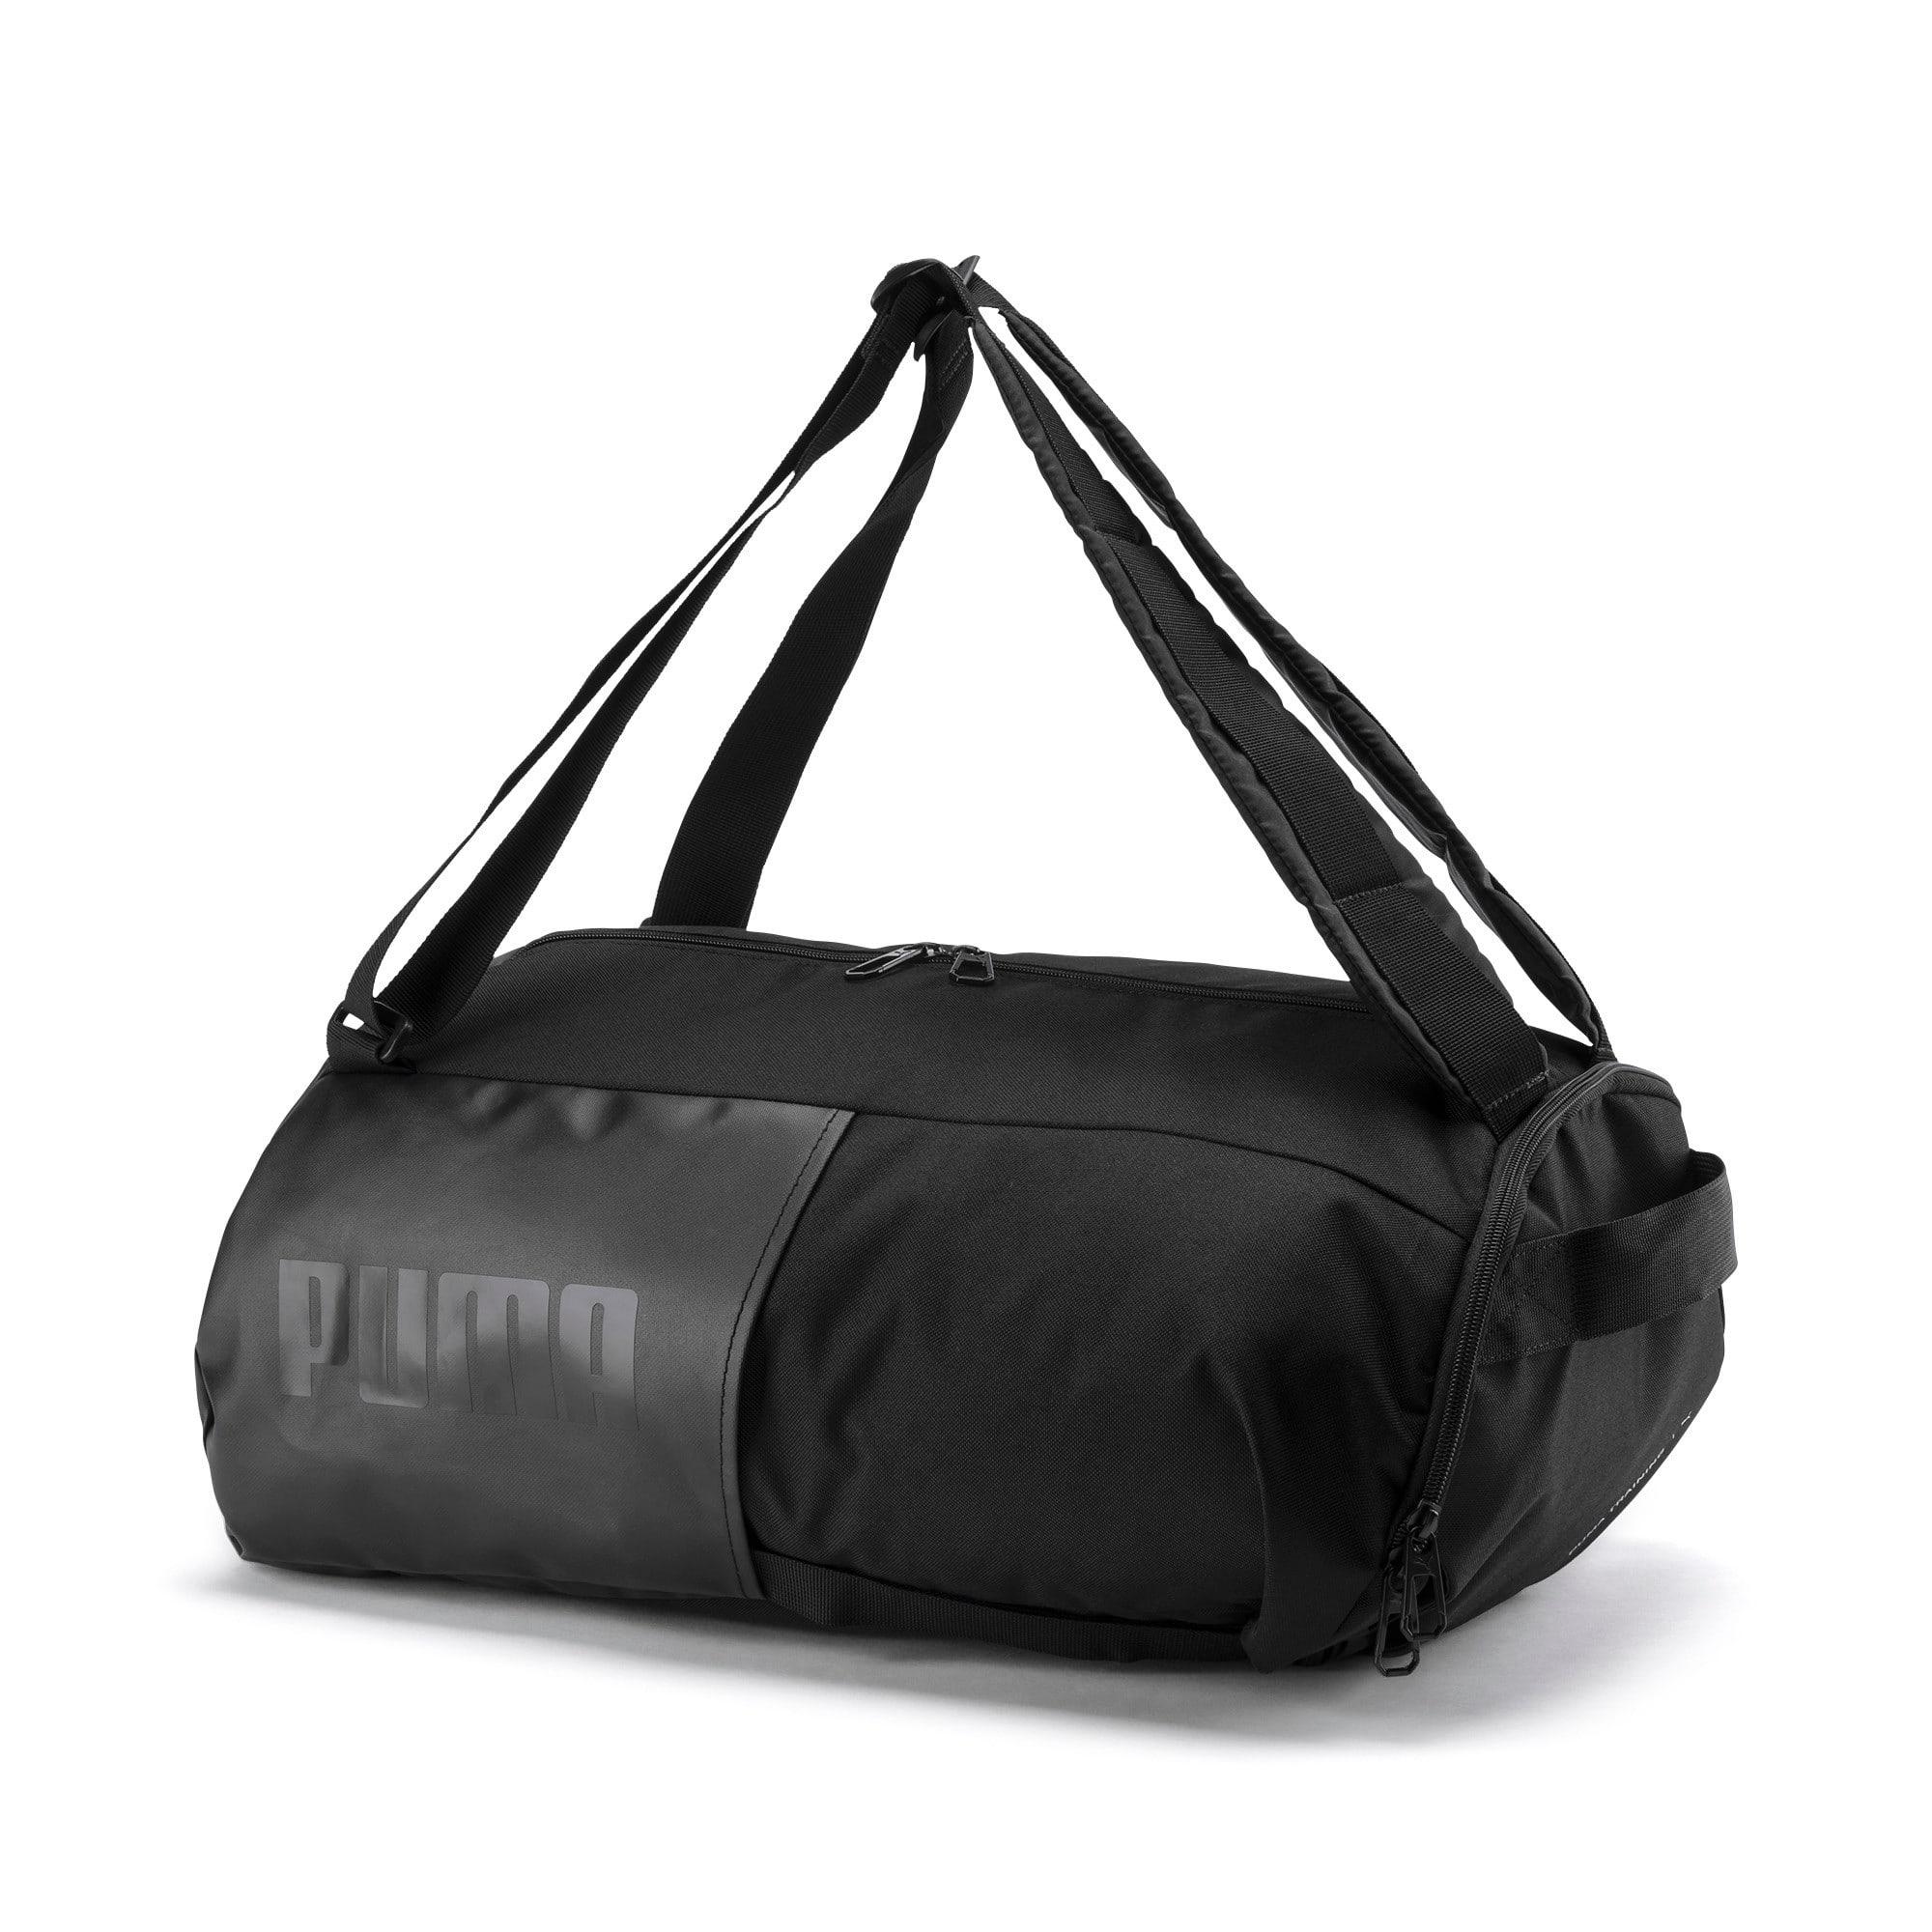 Thumbnail 7 of Training Transform Duffle Bag, Puma Black, medium-IND